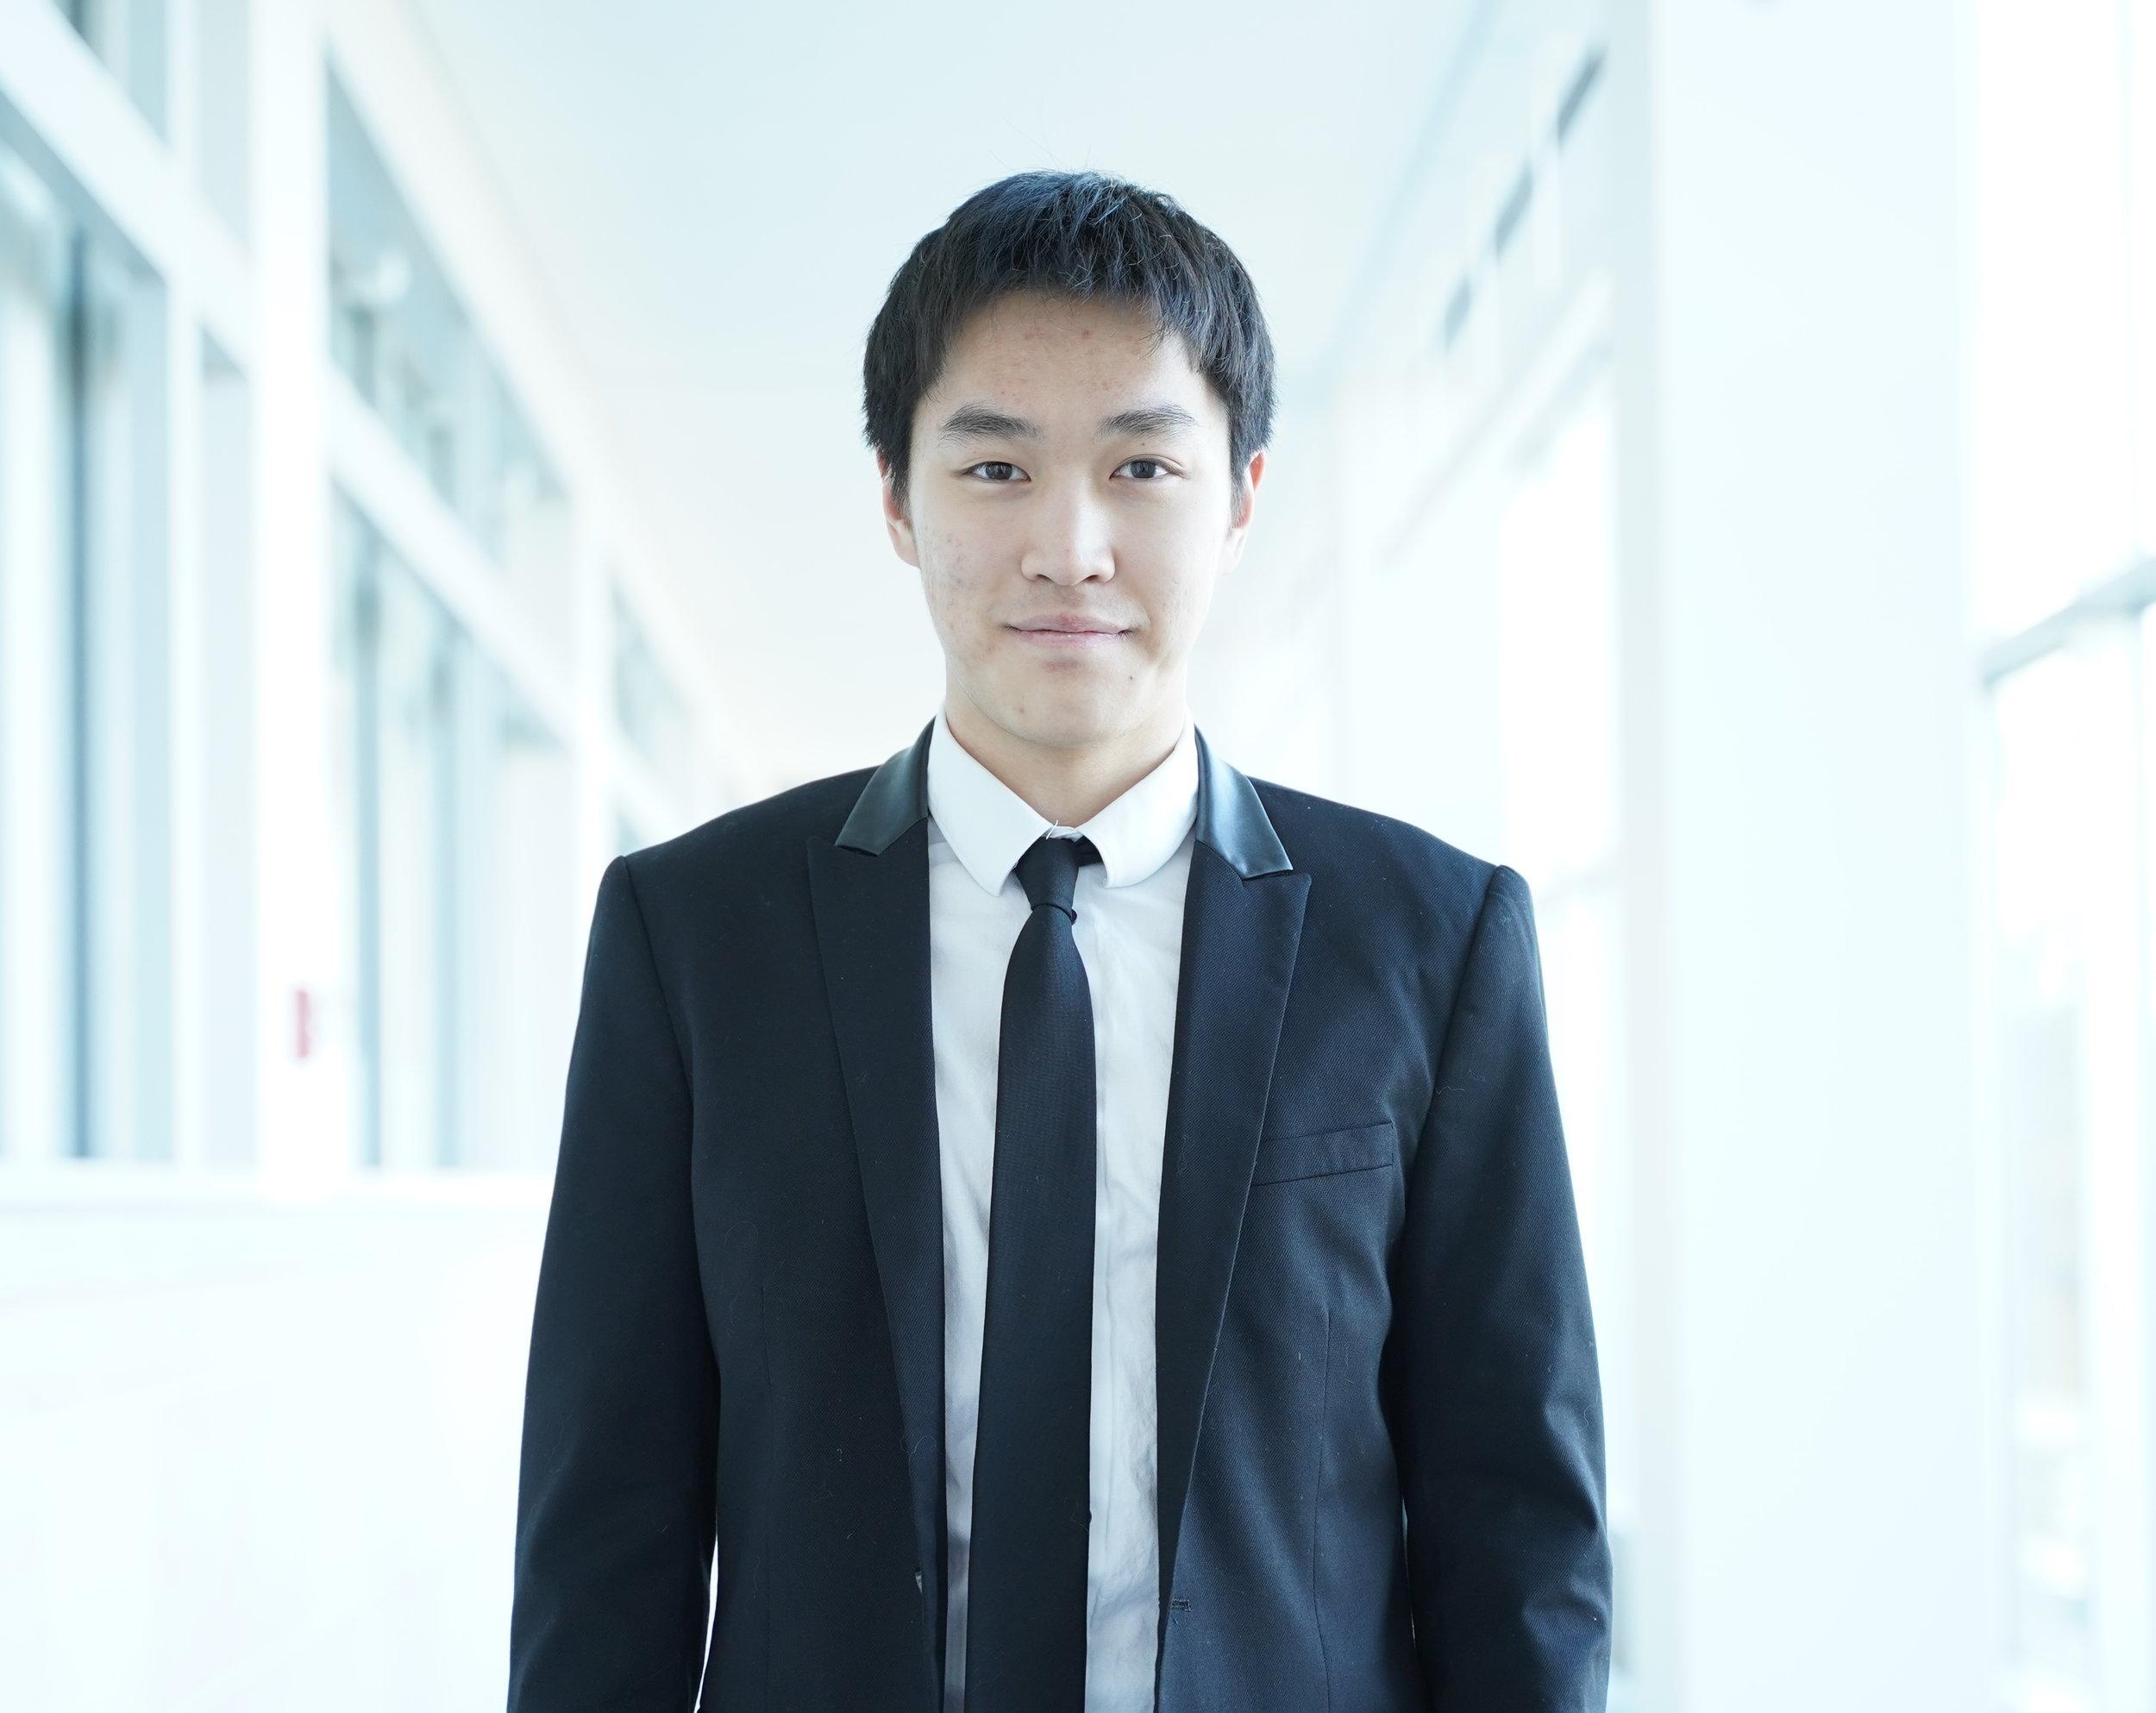 Sungjae Ahn '21 - Major: Applied Economics and Management